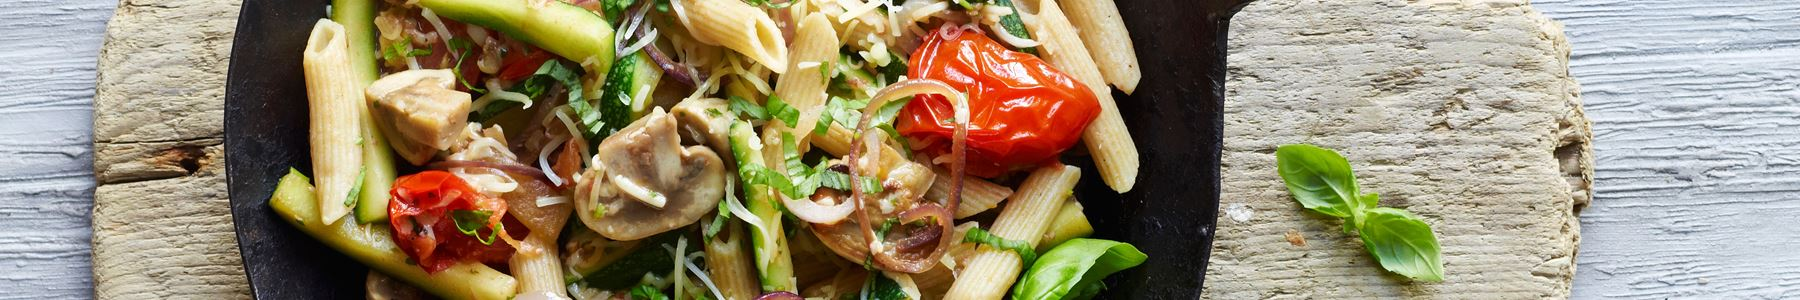 Tomat + Vegetarisk madplan + Ost